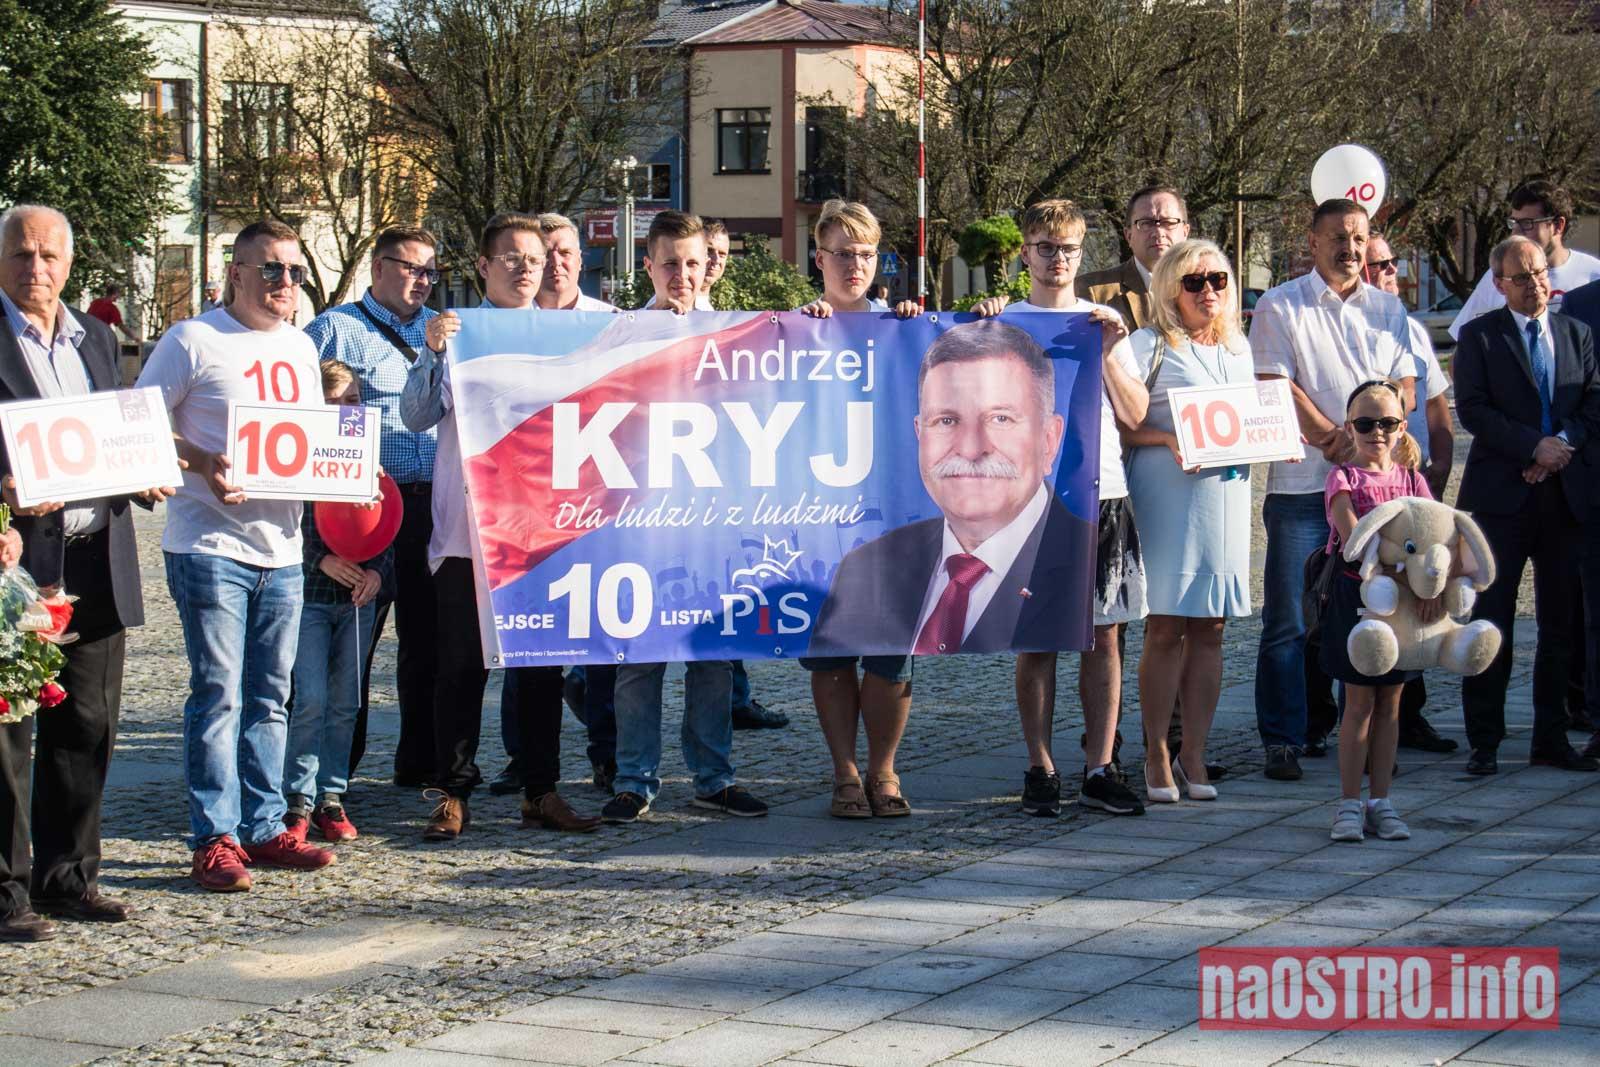 NaOSTRO Andrzej Kryj kampania-6